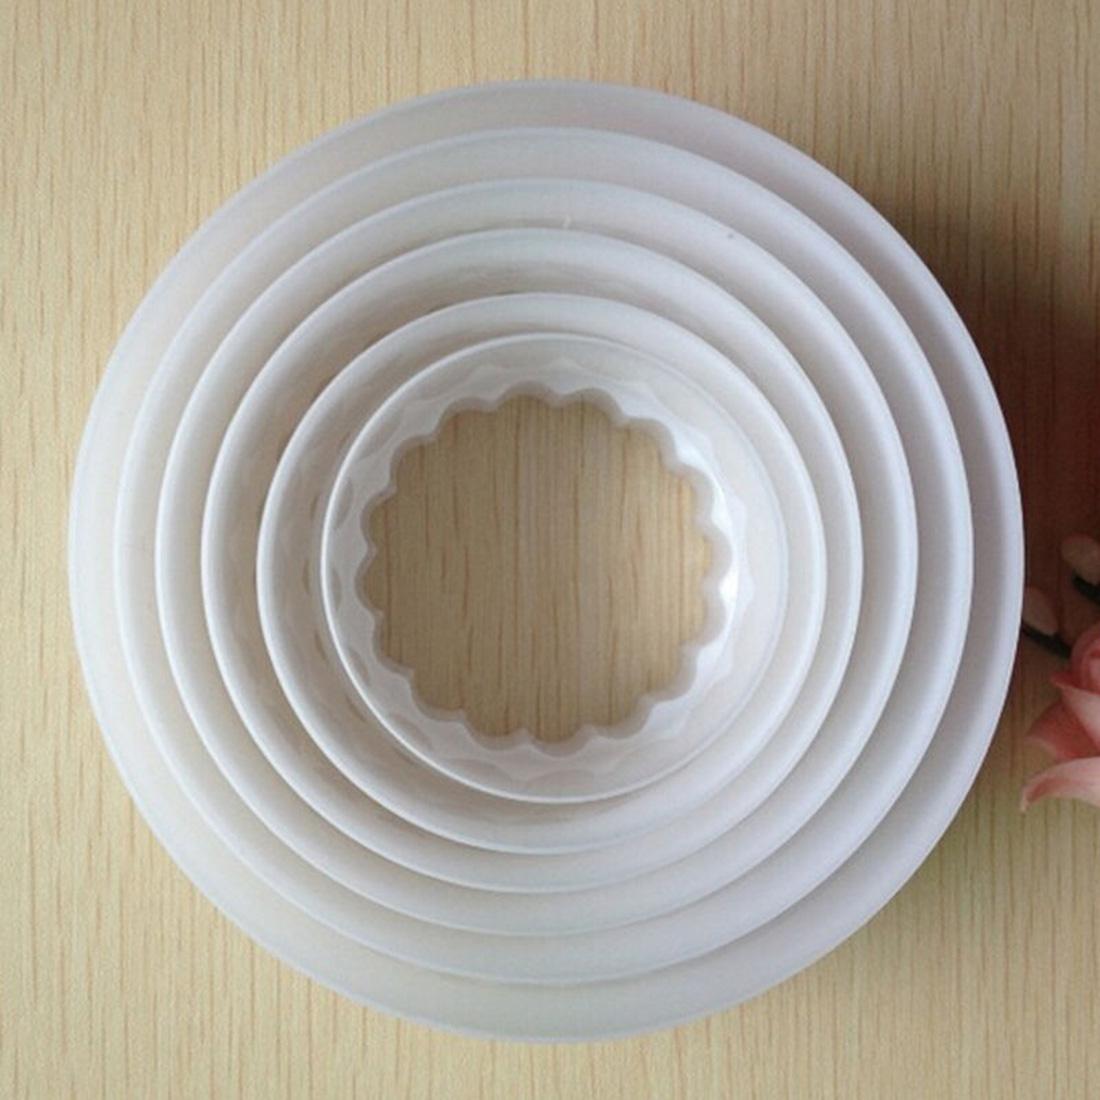 6Pcs/set Round Shape Sugarcraft Fondant Cake Decorating Cookies Cutter Paste Mold Tools(China (Mainland))